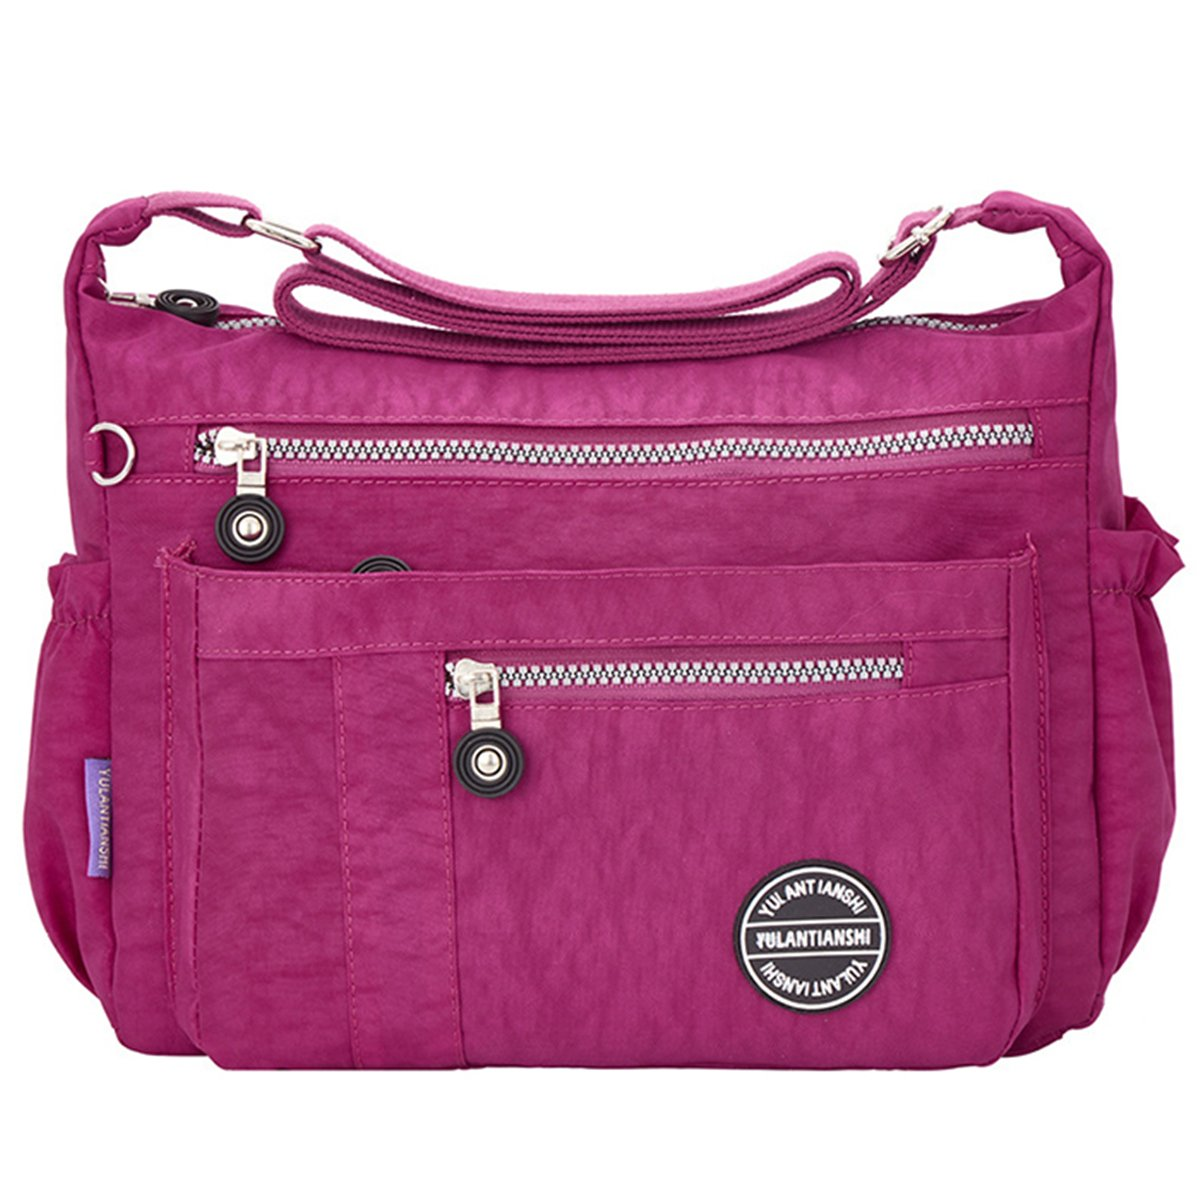 JOSEKO Nylon Shoulder Crossbody Bags, Women Nylon Waterproof Large Capacity Leisure Crossbody Bag JOSEKOUSRnal1676